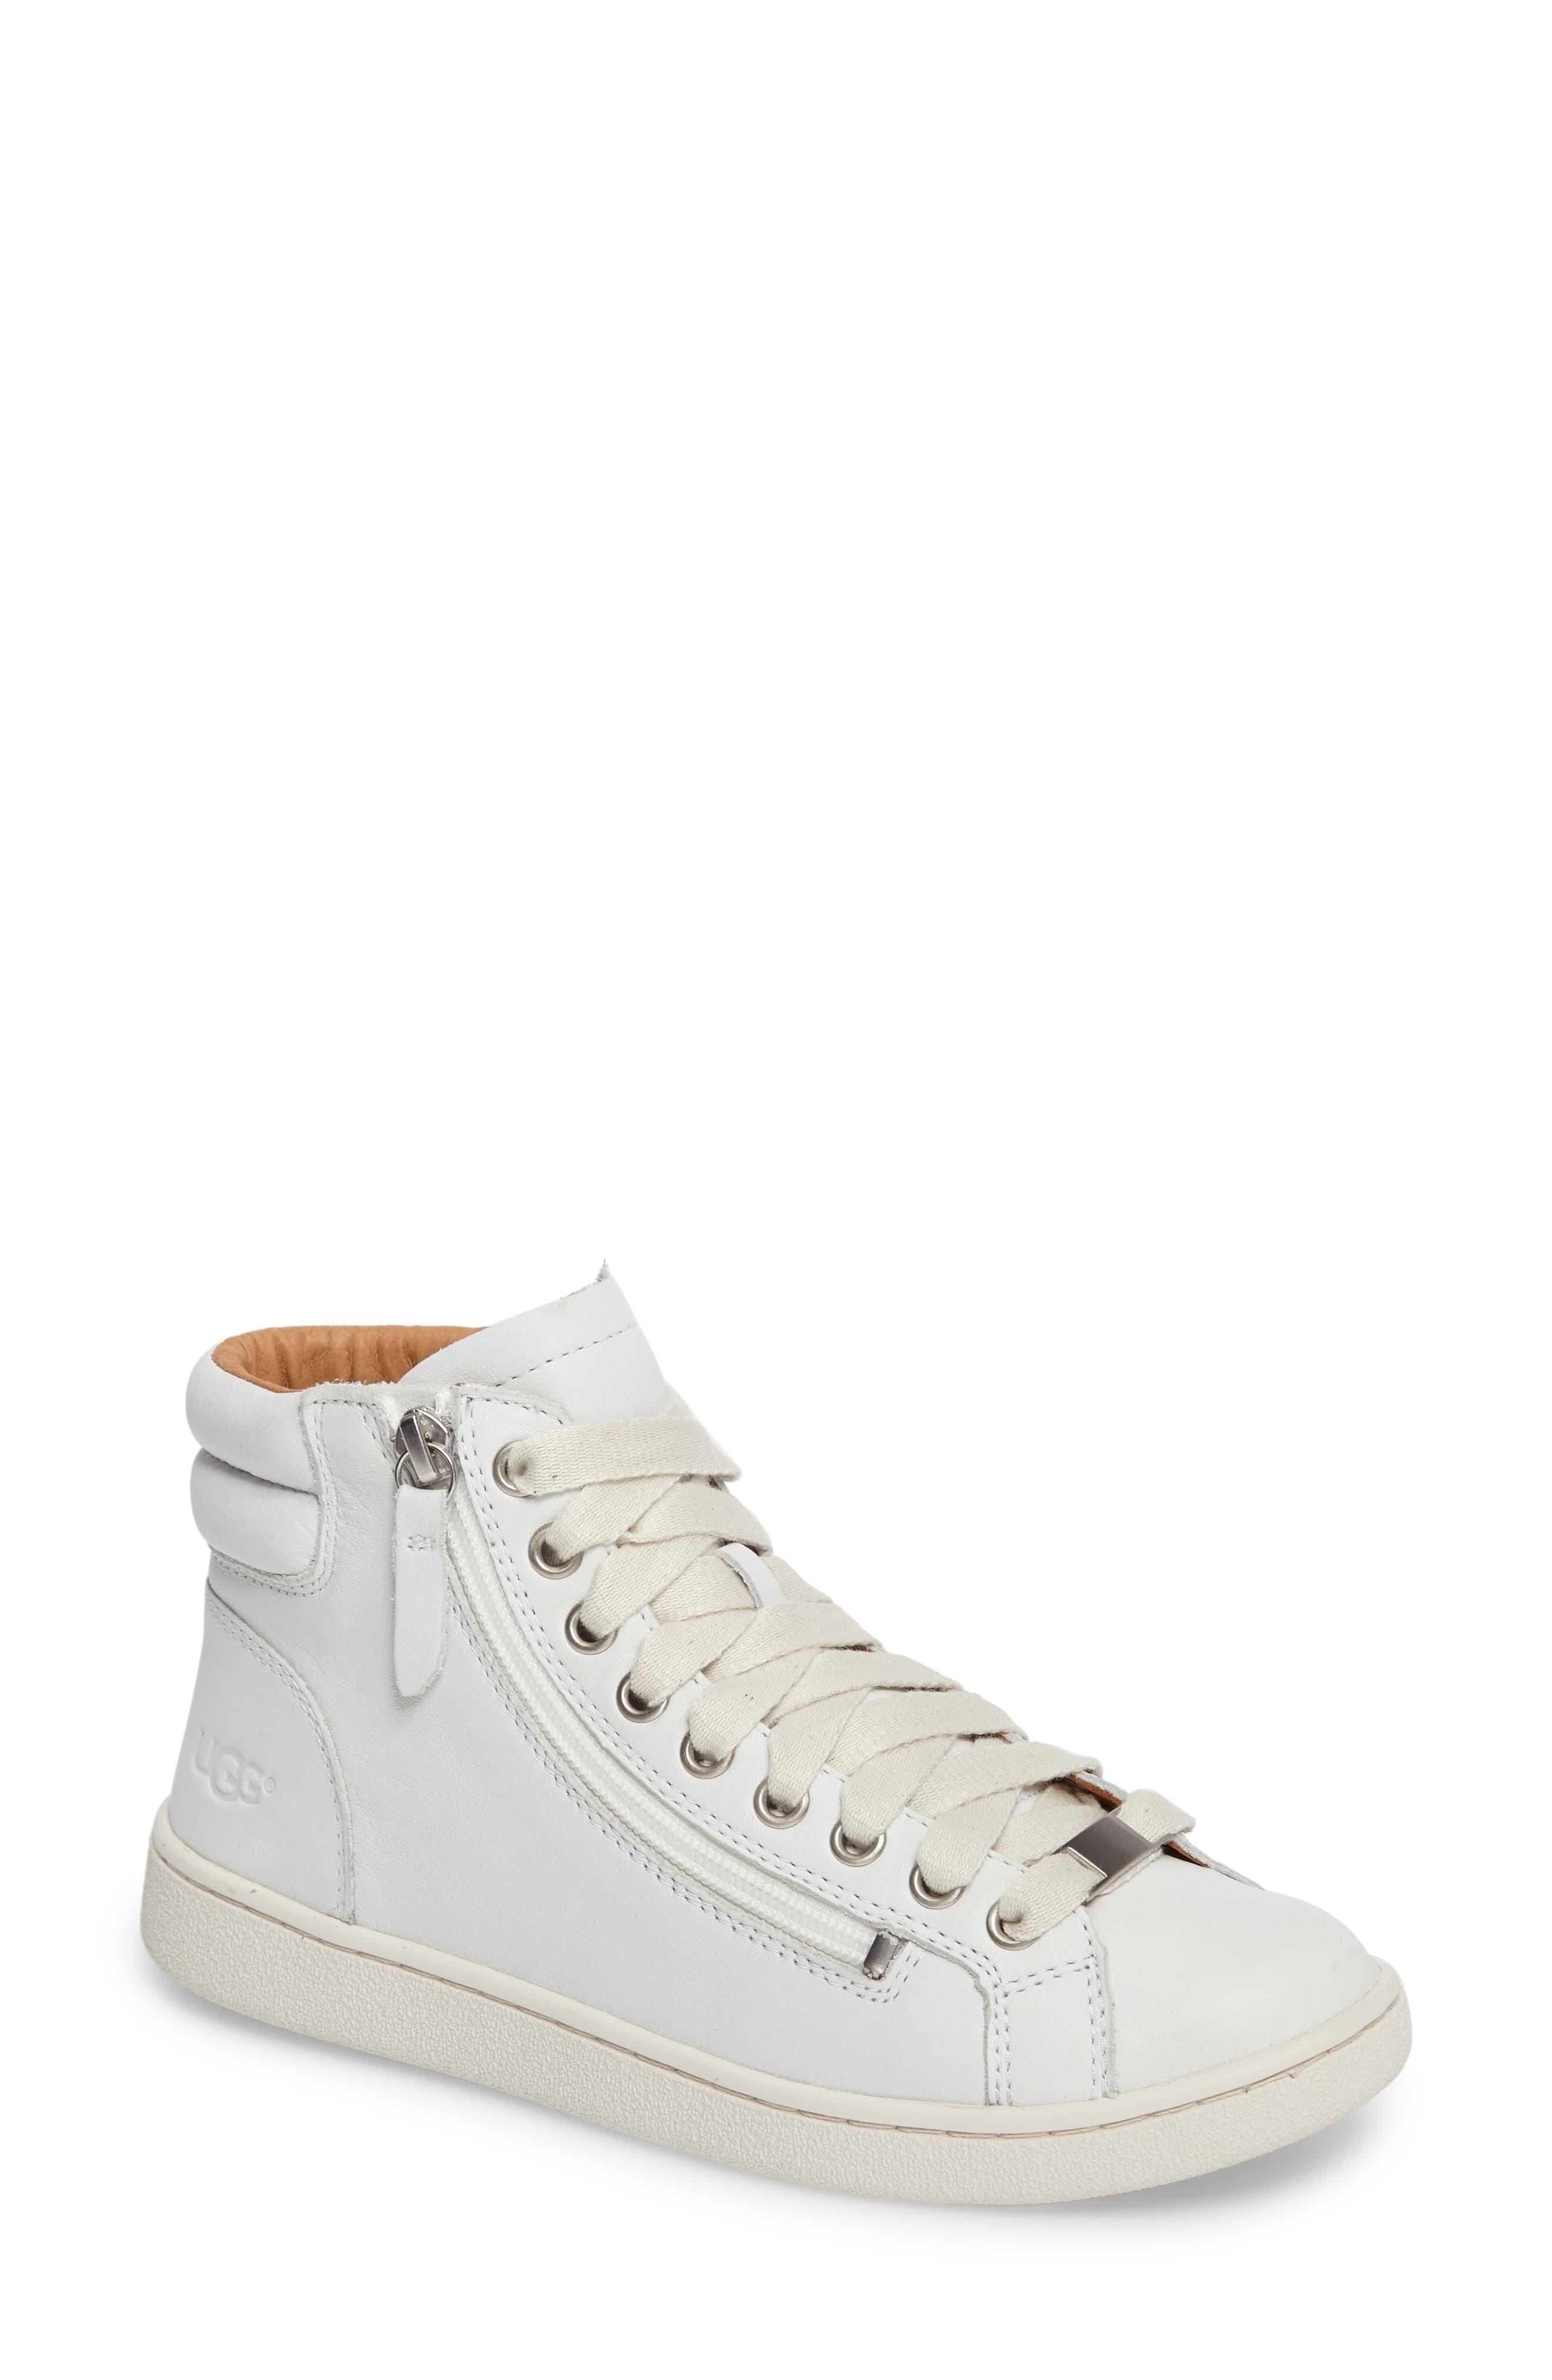 UGG Olive High Top Sneaker (Women)